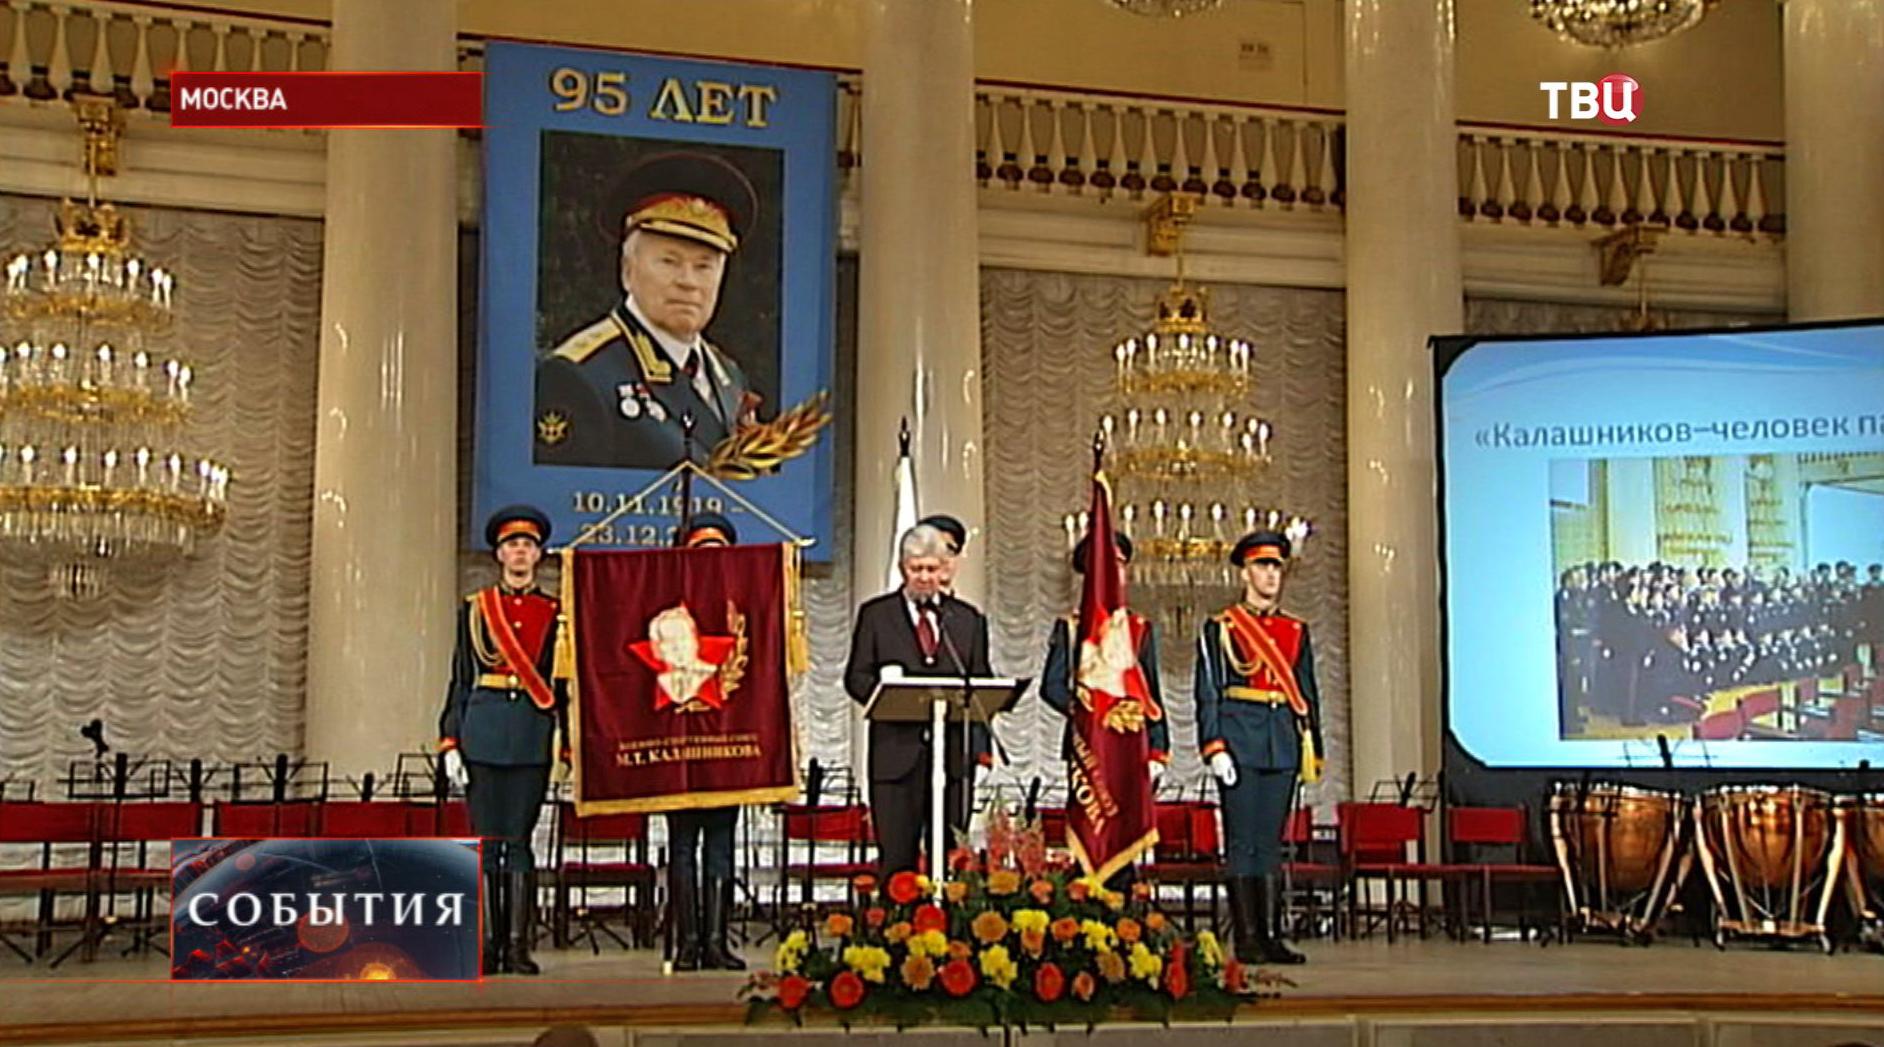 Конференция в Колонном зале Дома Союза